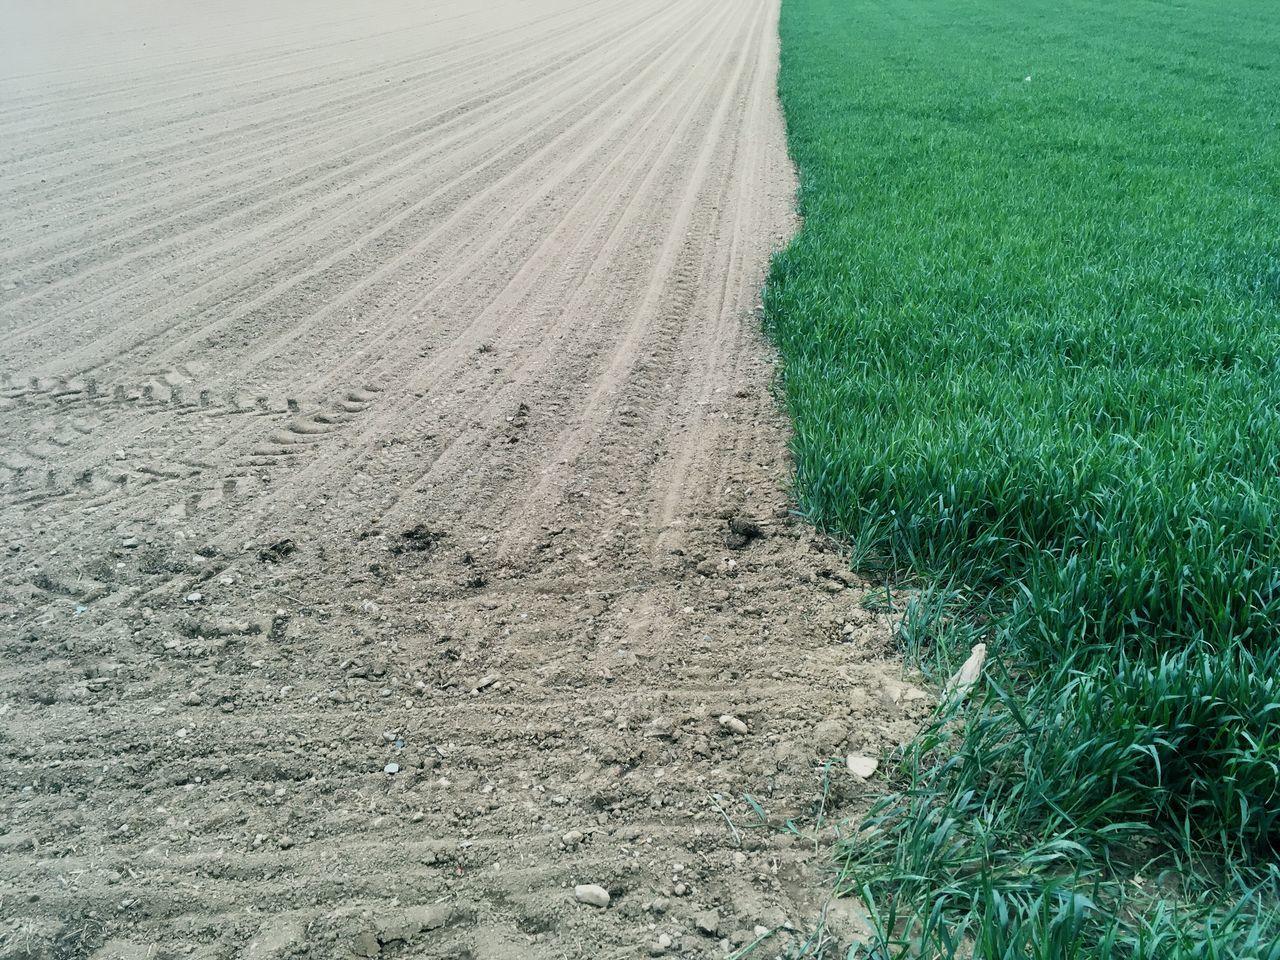 Landscape Agriculture Field Nature